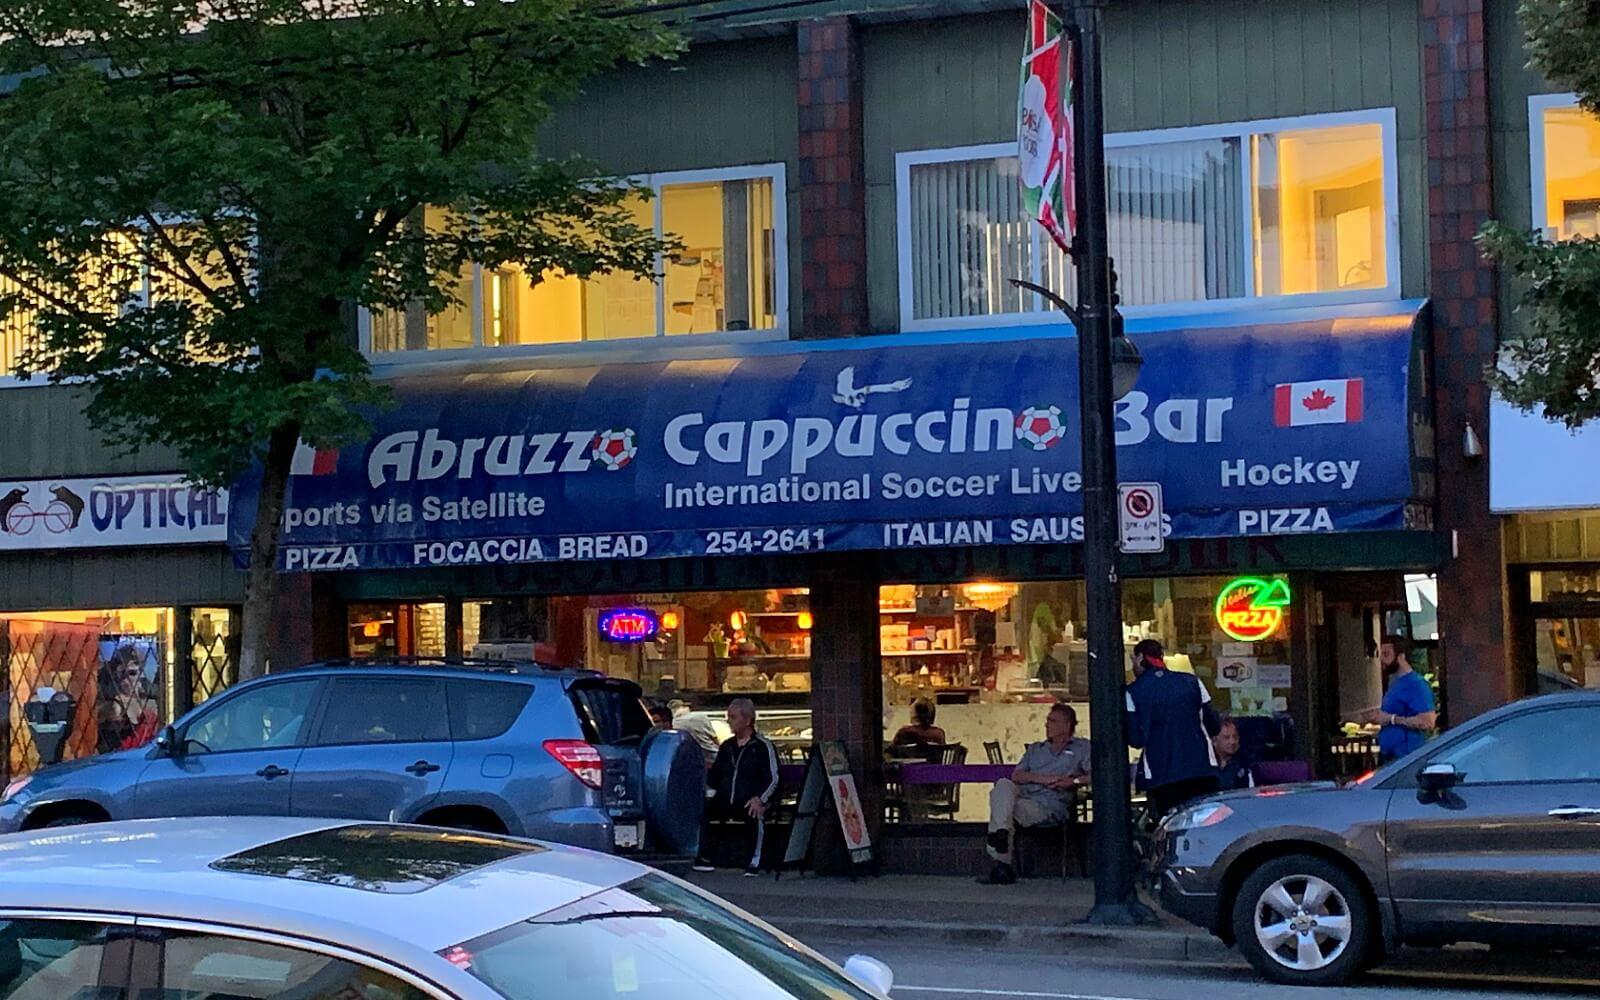 abruzzo cappuccino bar on commercial drive vancouver bc